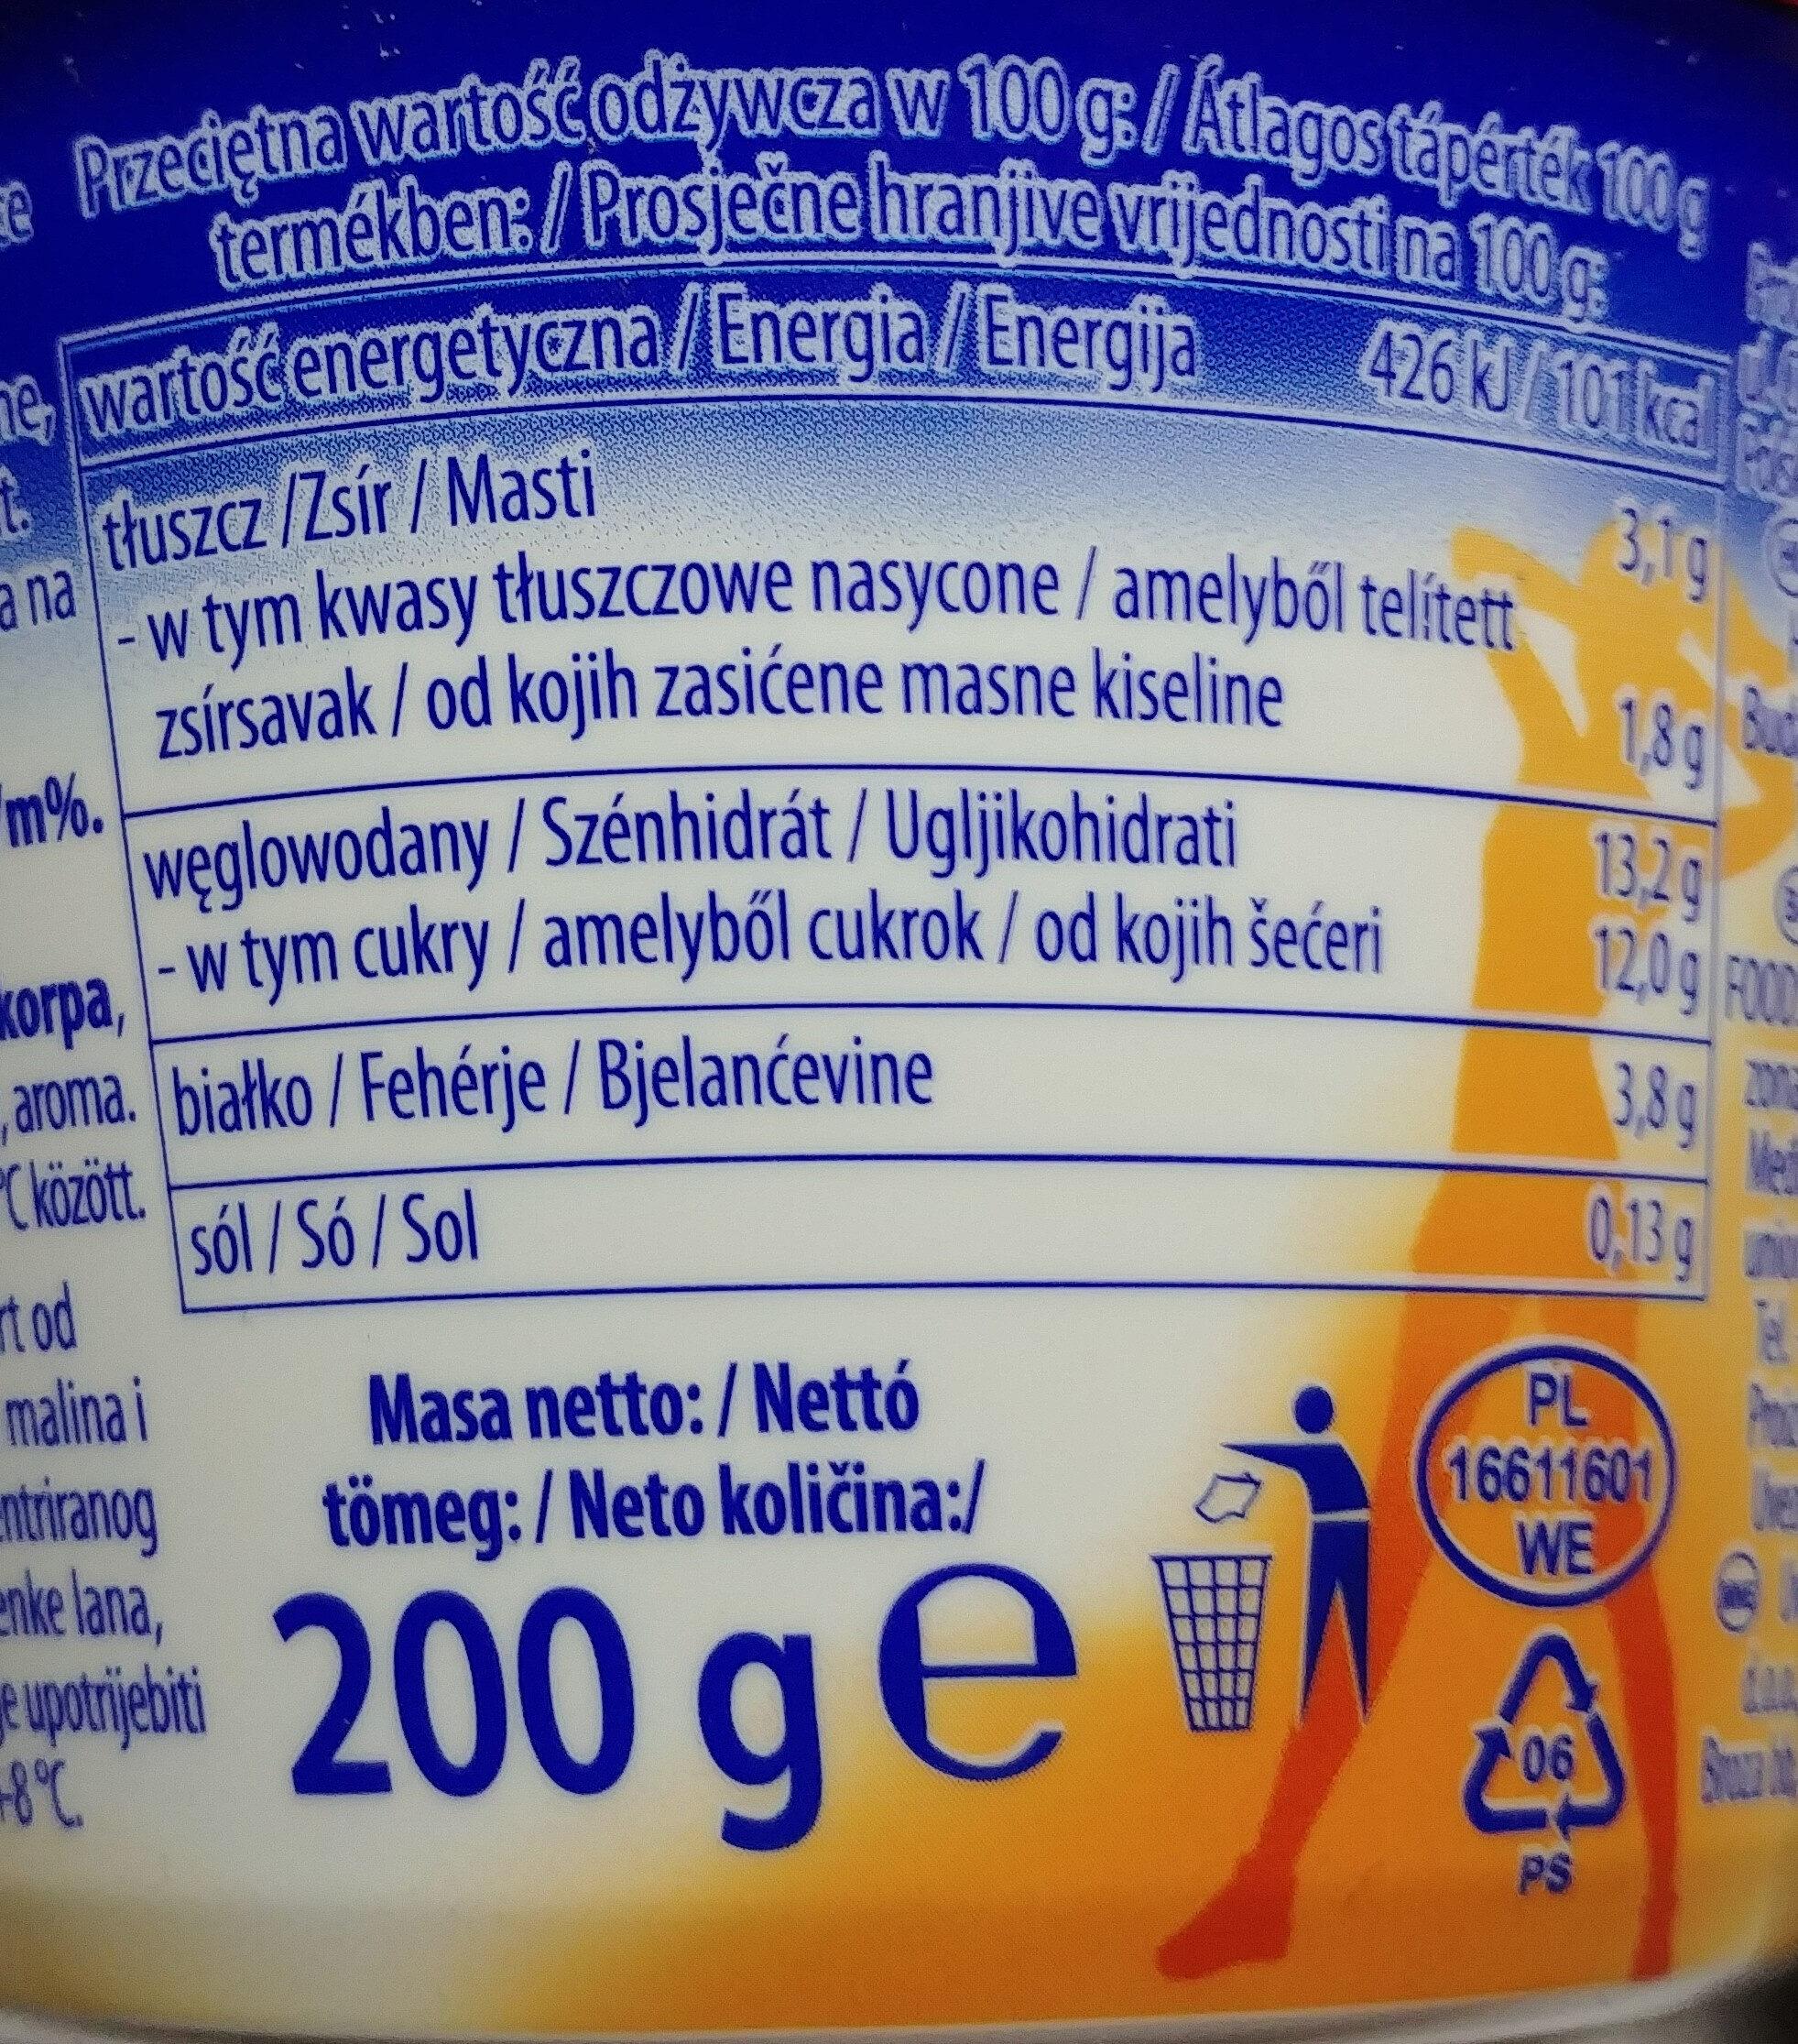 Jogurt z malinami i ananasem oraz z musli. - Informations nutritionnelles